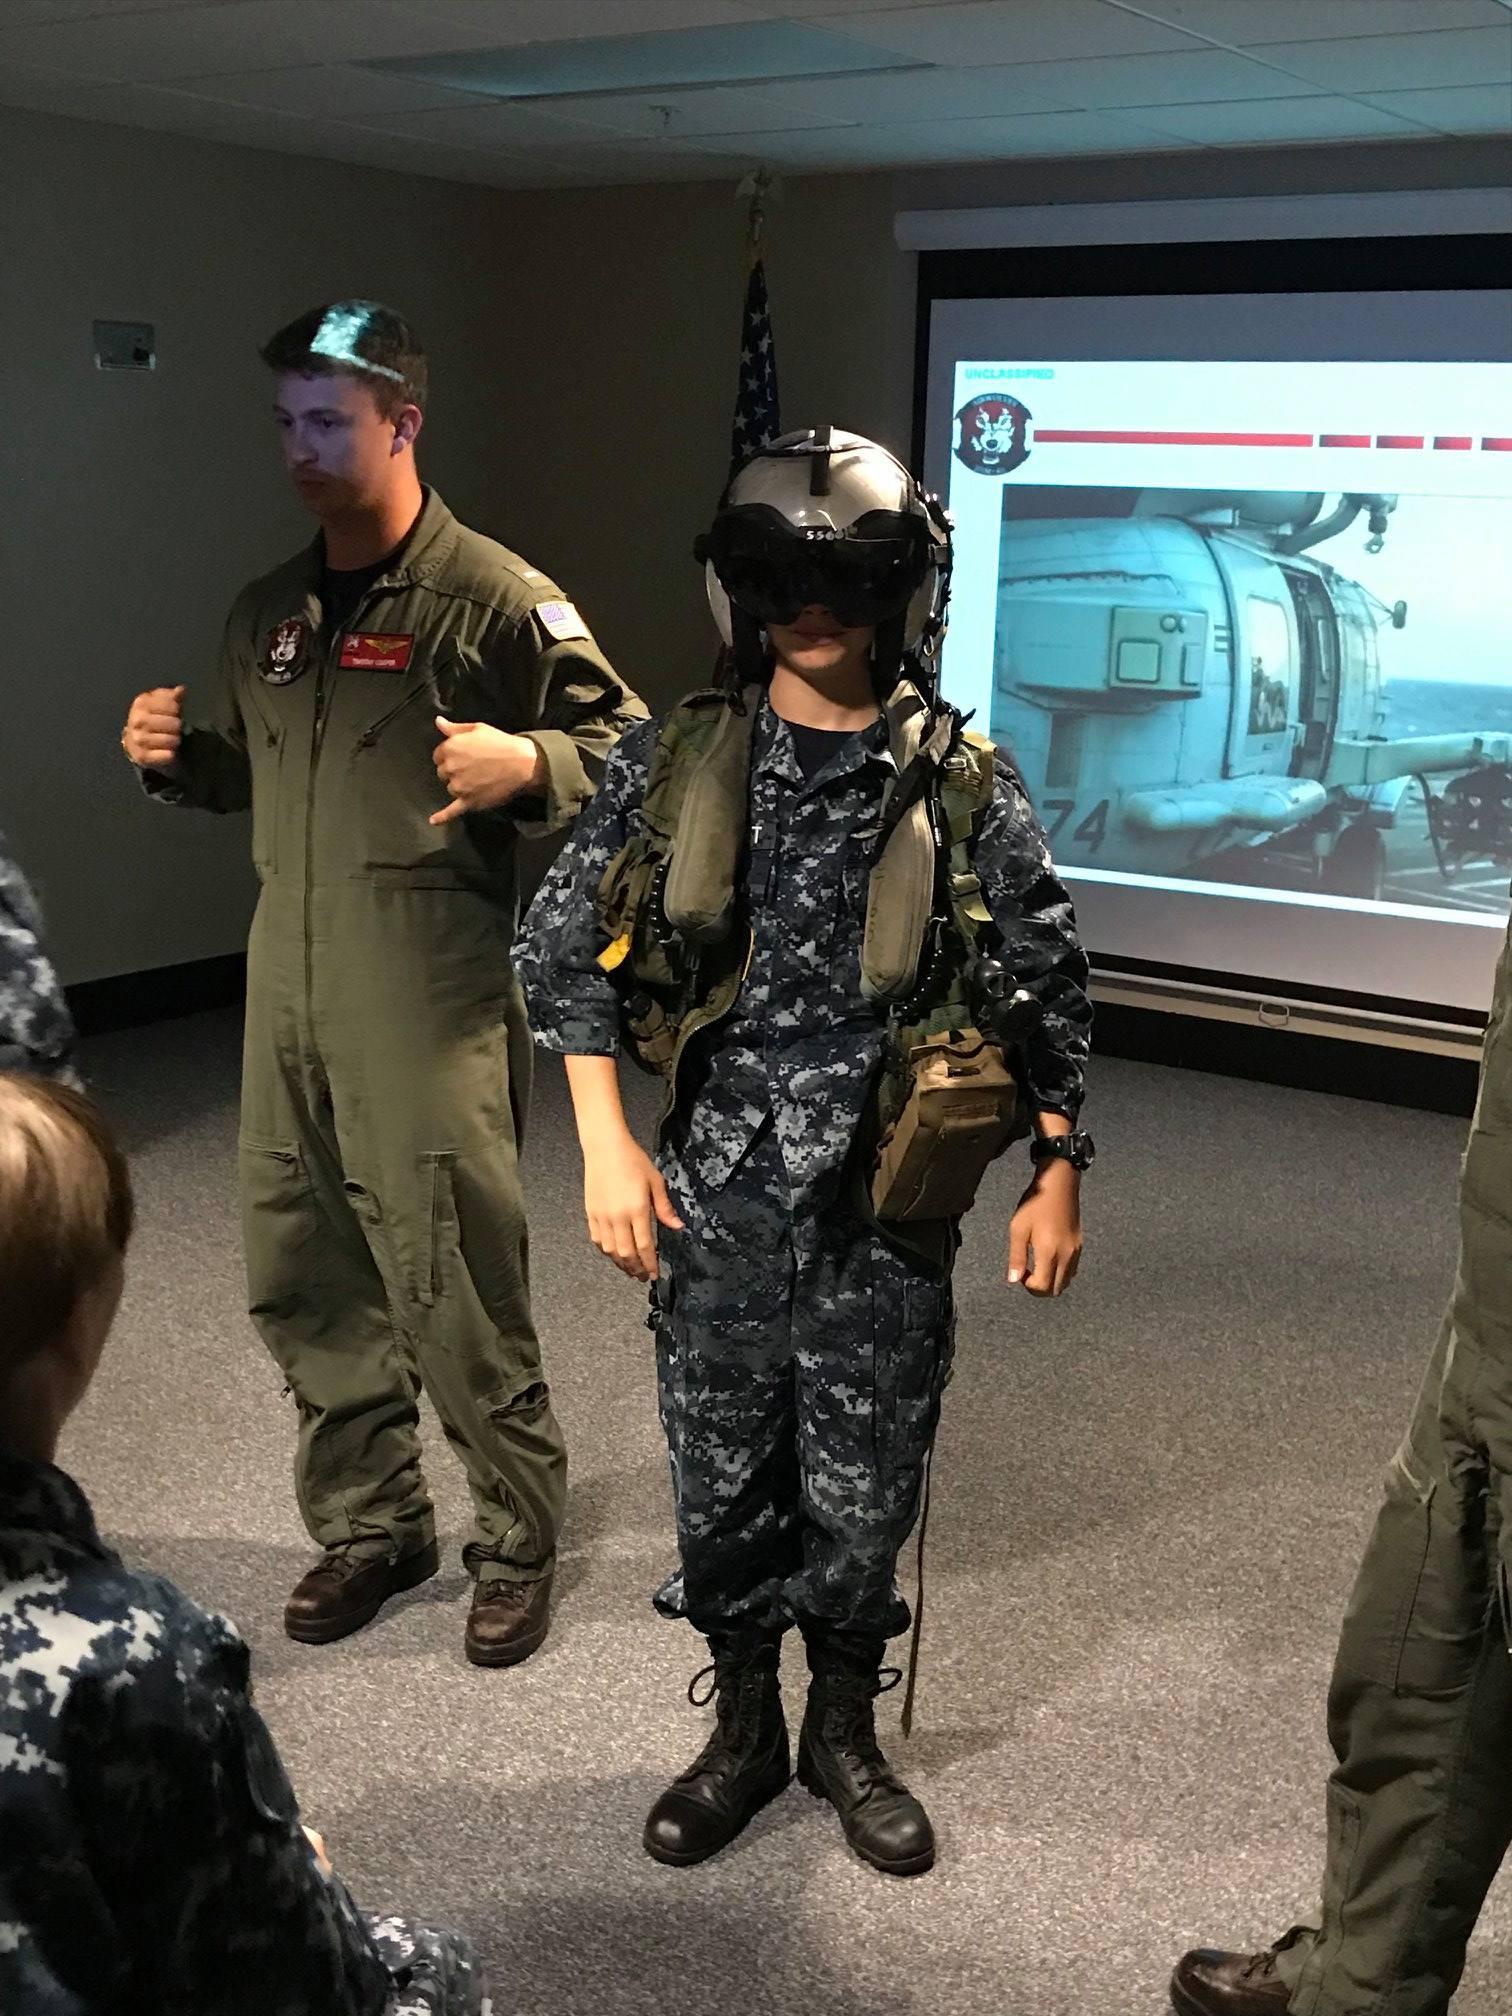 Drill at Mayport Naval Station